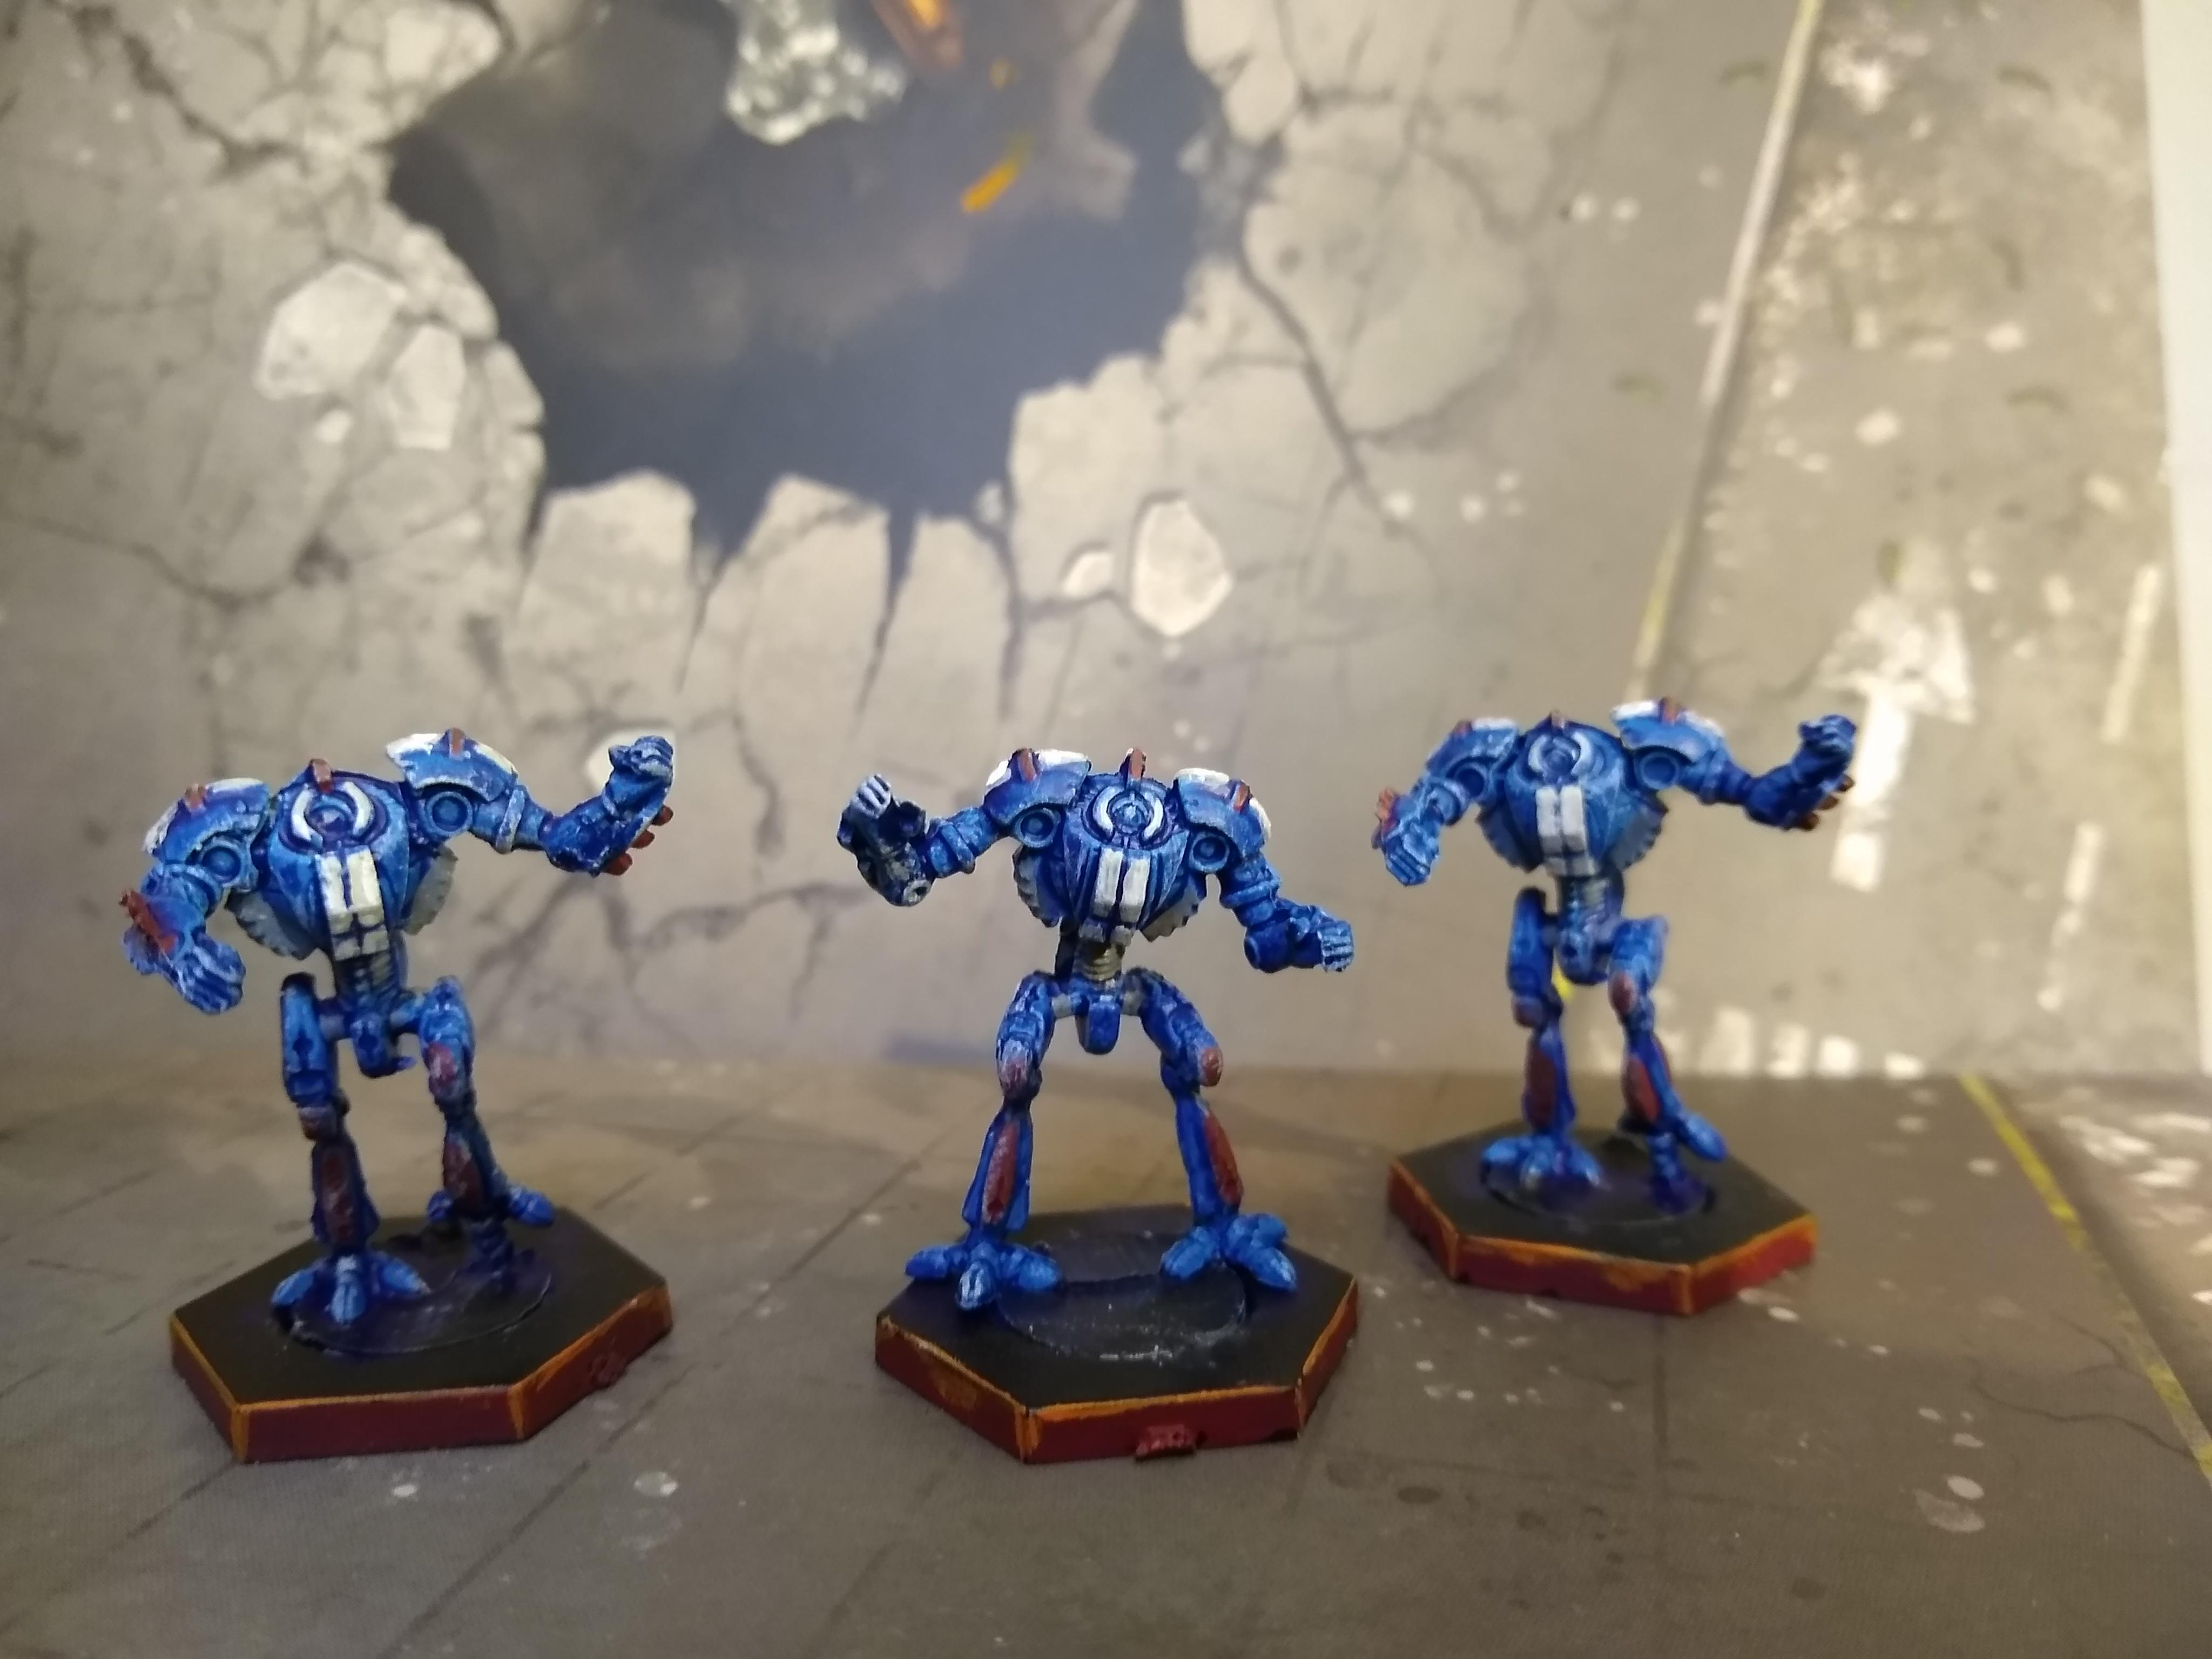 Cybertronian Cogs guards